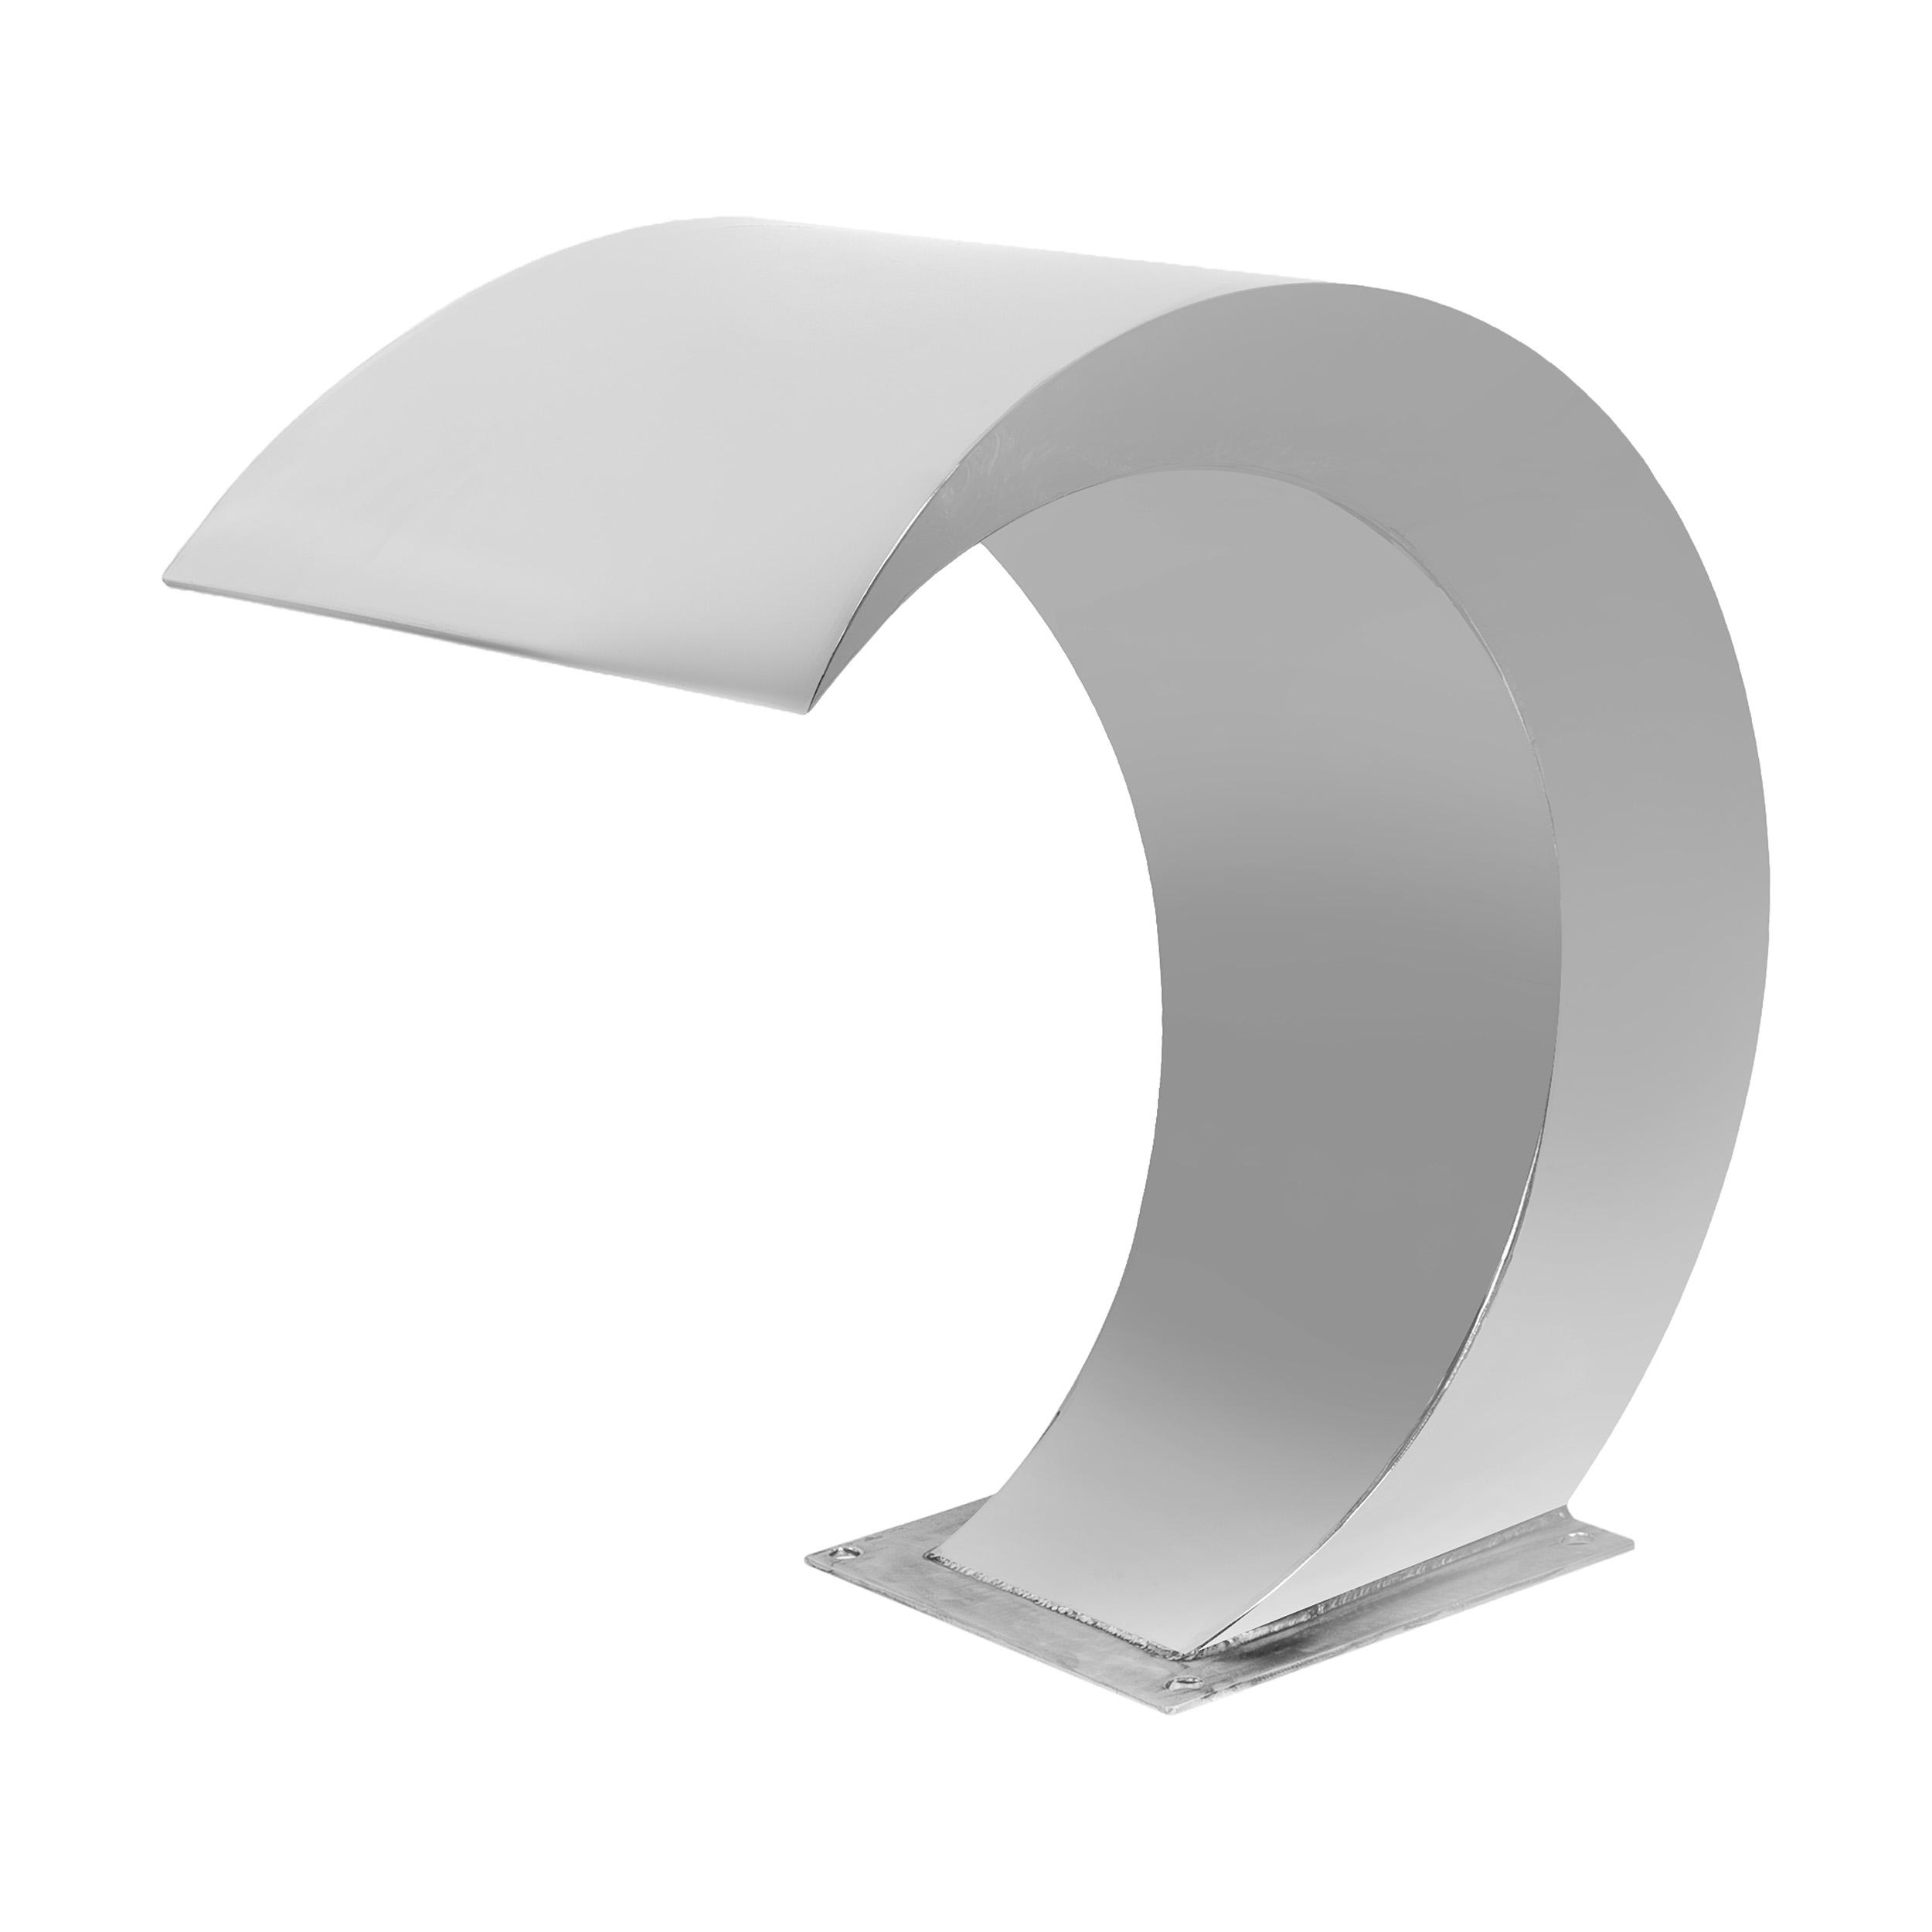 فواره استخر مدل آبشار کد 002